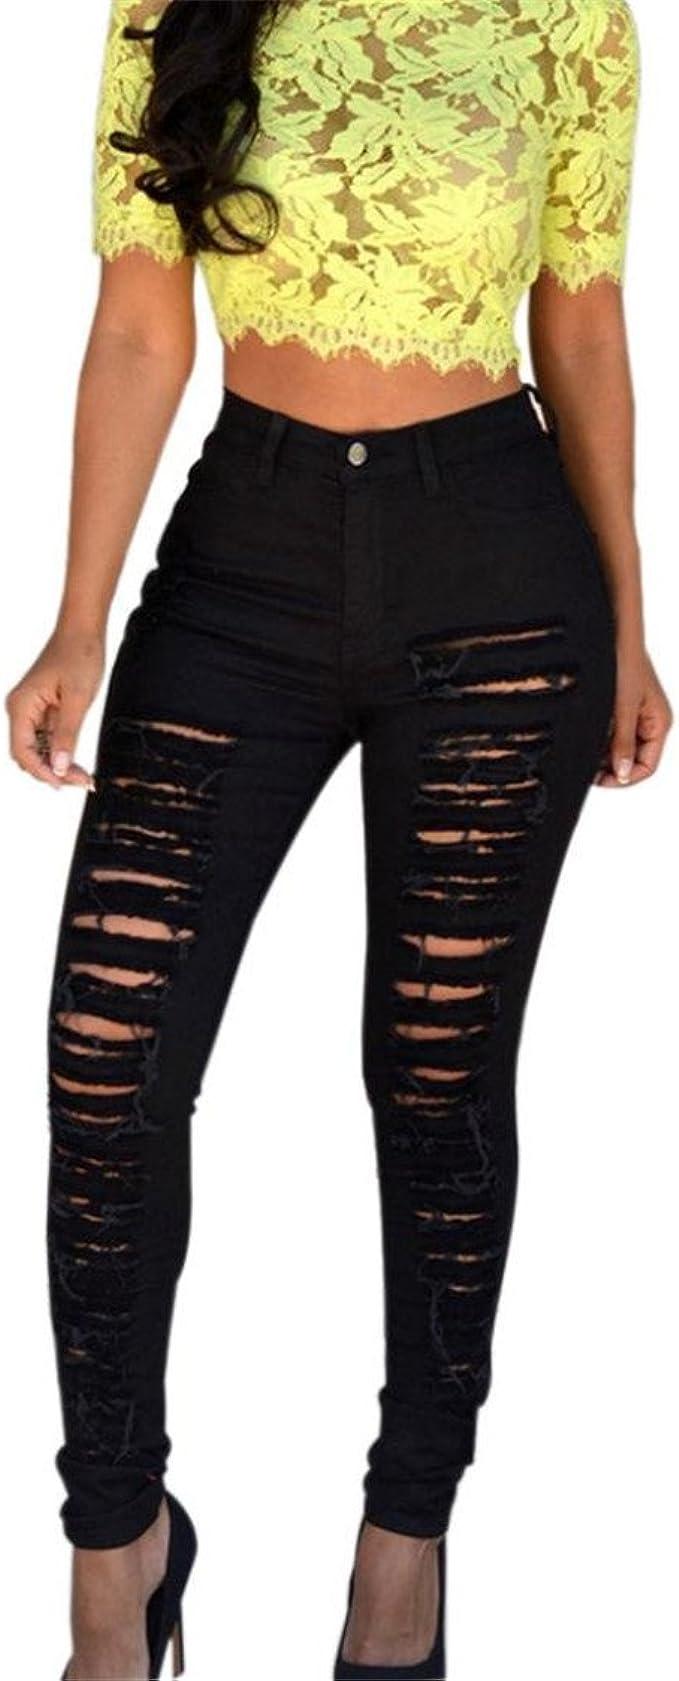 Trouser Women Autumn Winter Clothes Leather High Waist Stretch Pencil Pants Jean